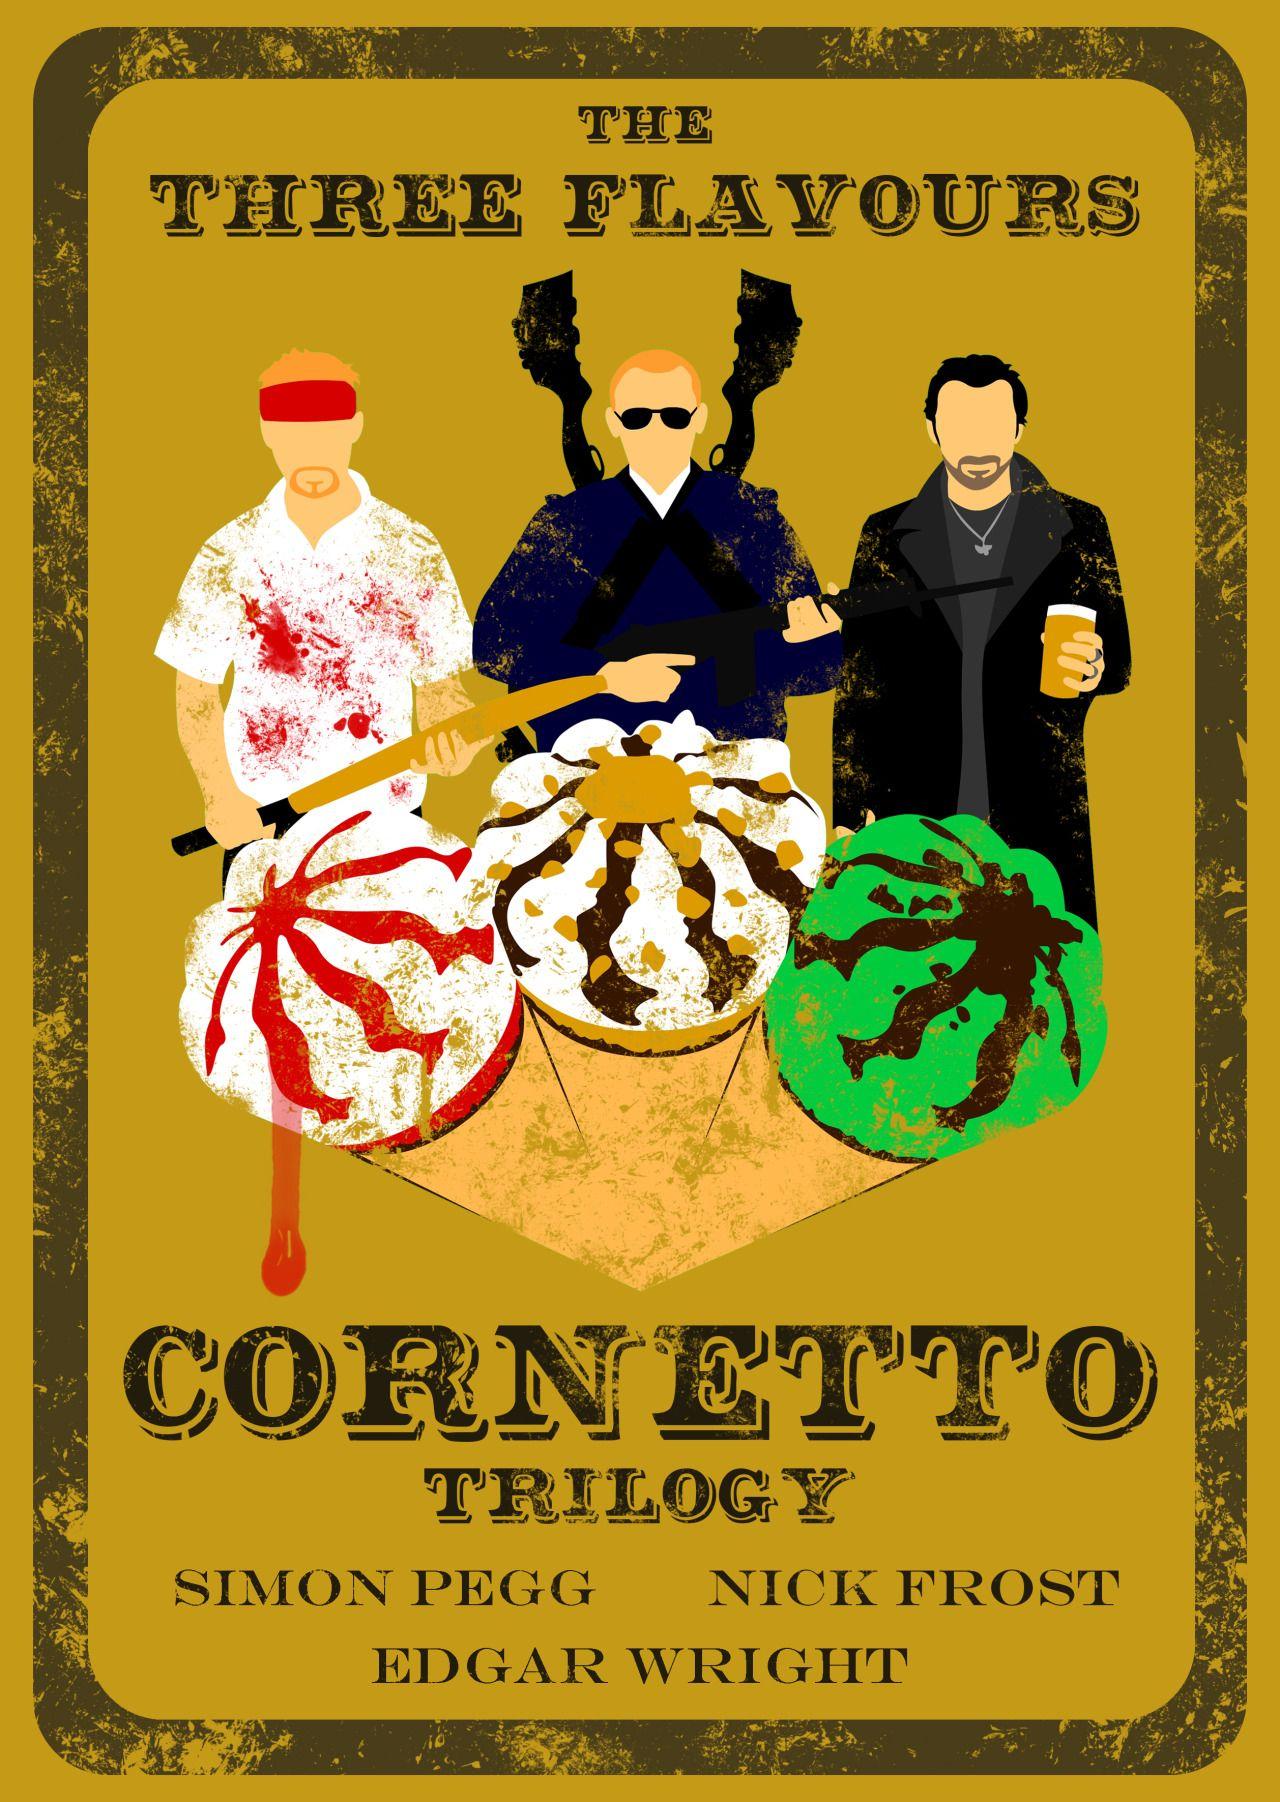 The Cornetto Trilogy The World S End Photo Trilogy Simon Pegg Film Music Books